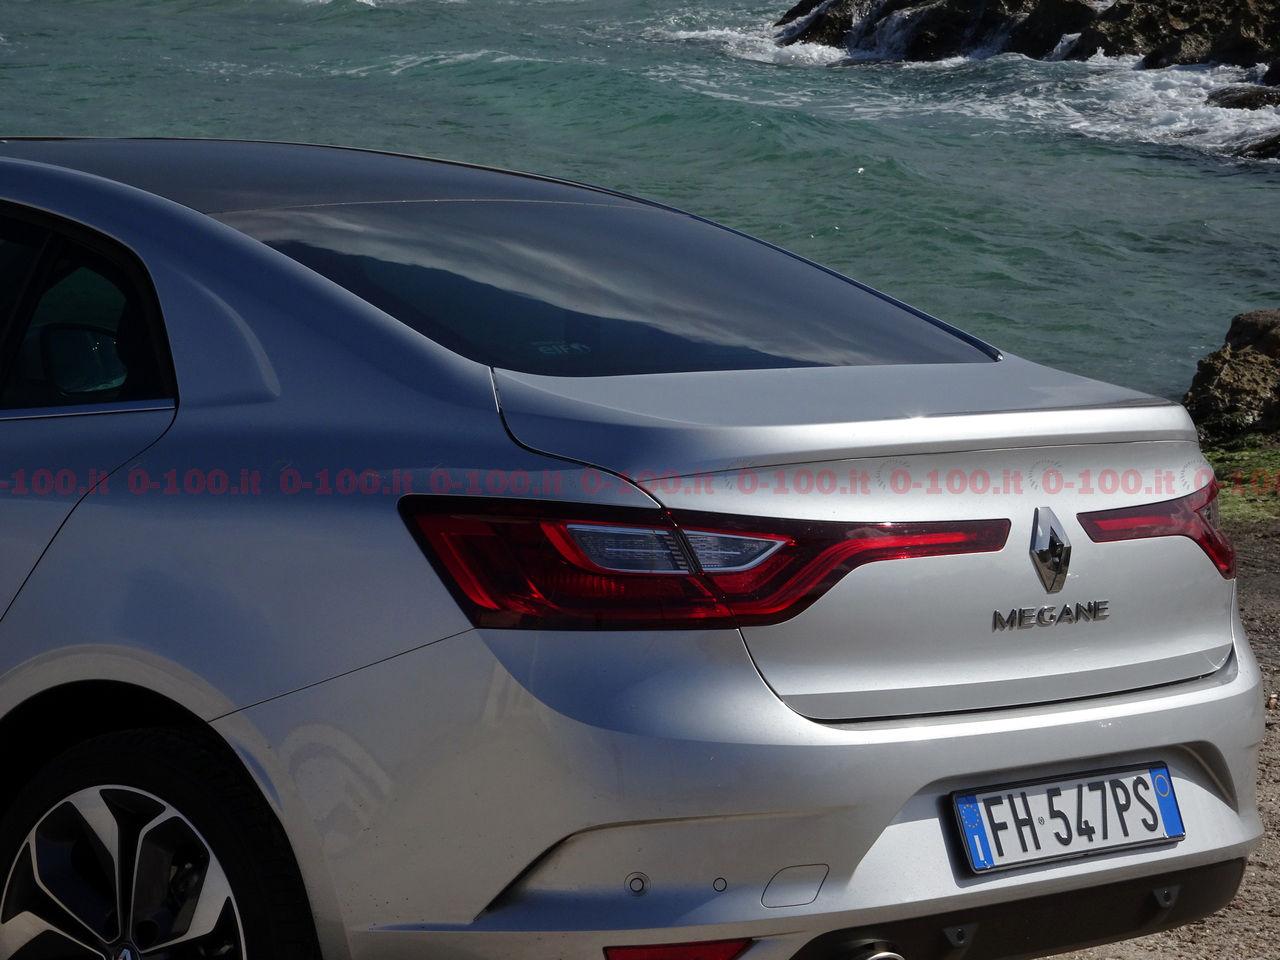 renault-megane-grand-coupe-dci-110-130-cv-test-prova-impressioni_0-100_18